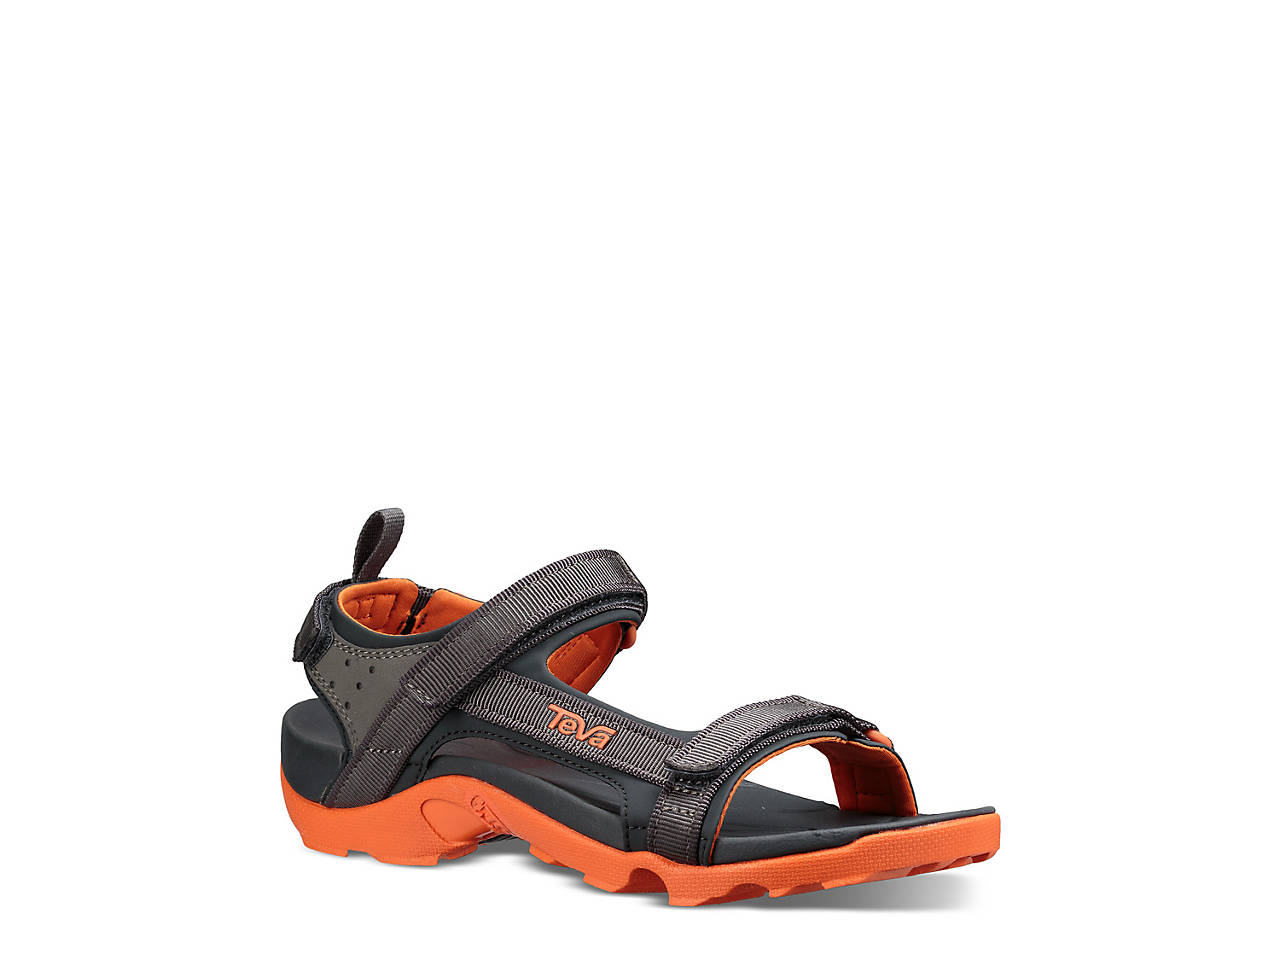 9a0dc15cddd7 Teva Tanza Toddler   Youth Sandal Kids Shoes